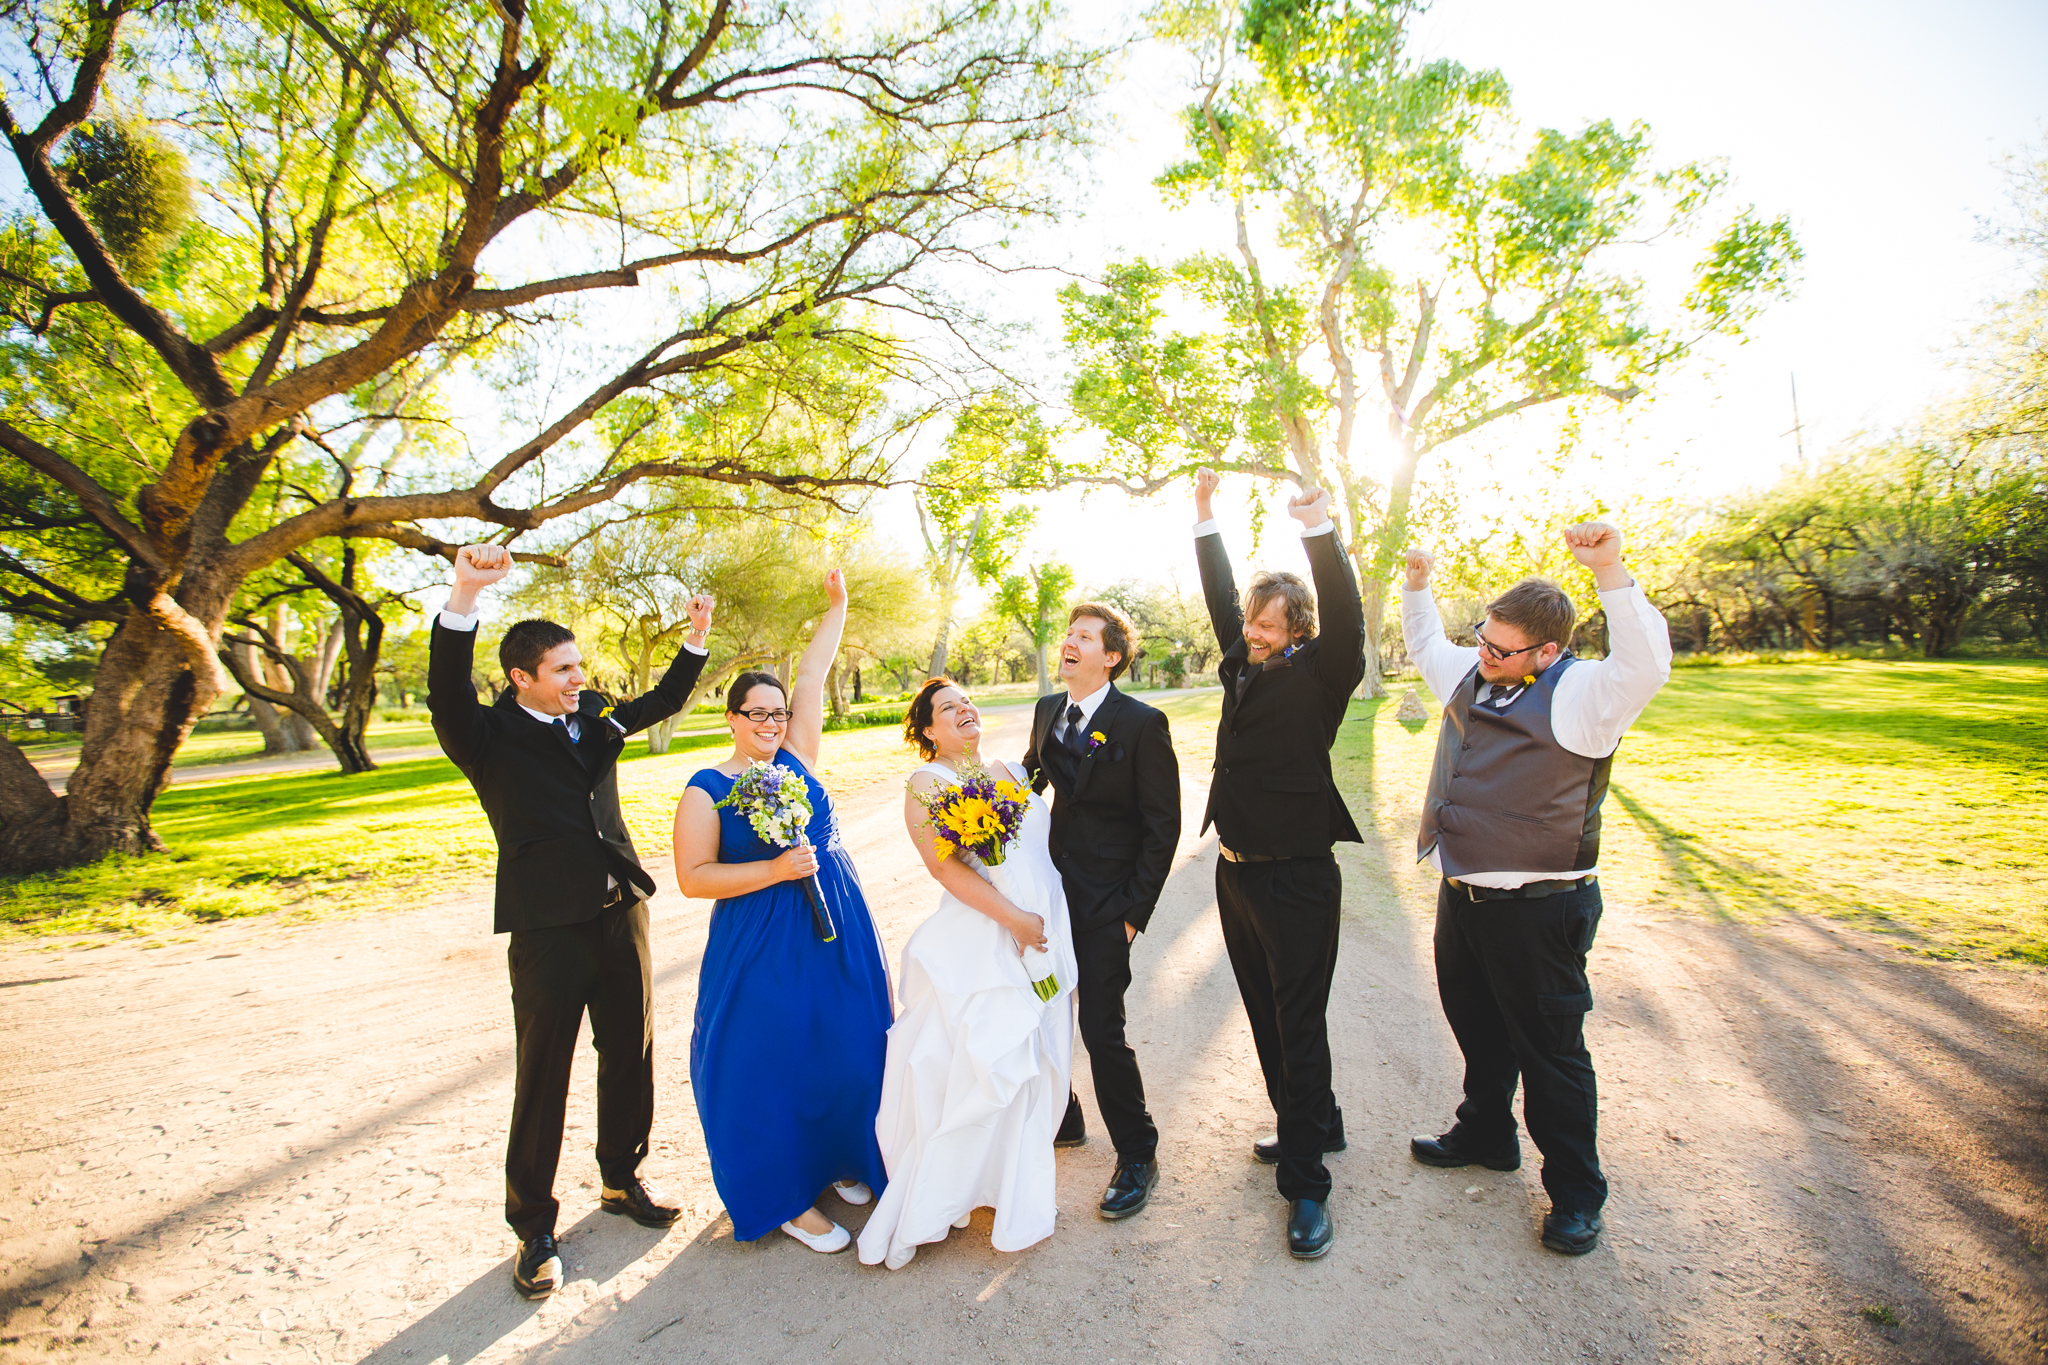 aaron-kes-photography-agua-linda-farm-tucson-wedding-ek12.jpg